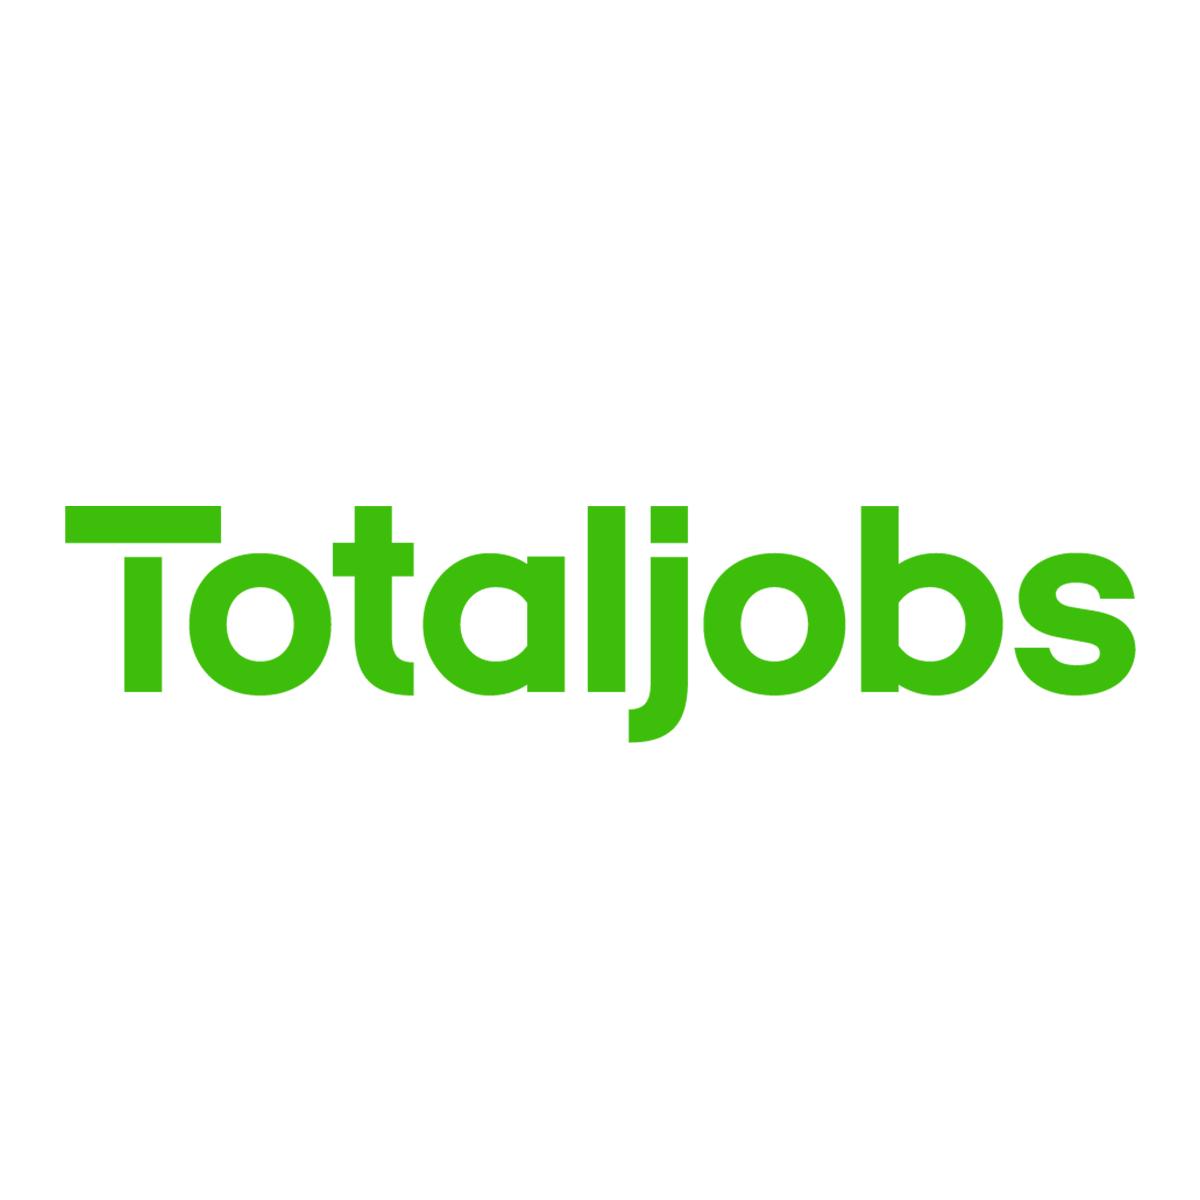 Total Jobs logo